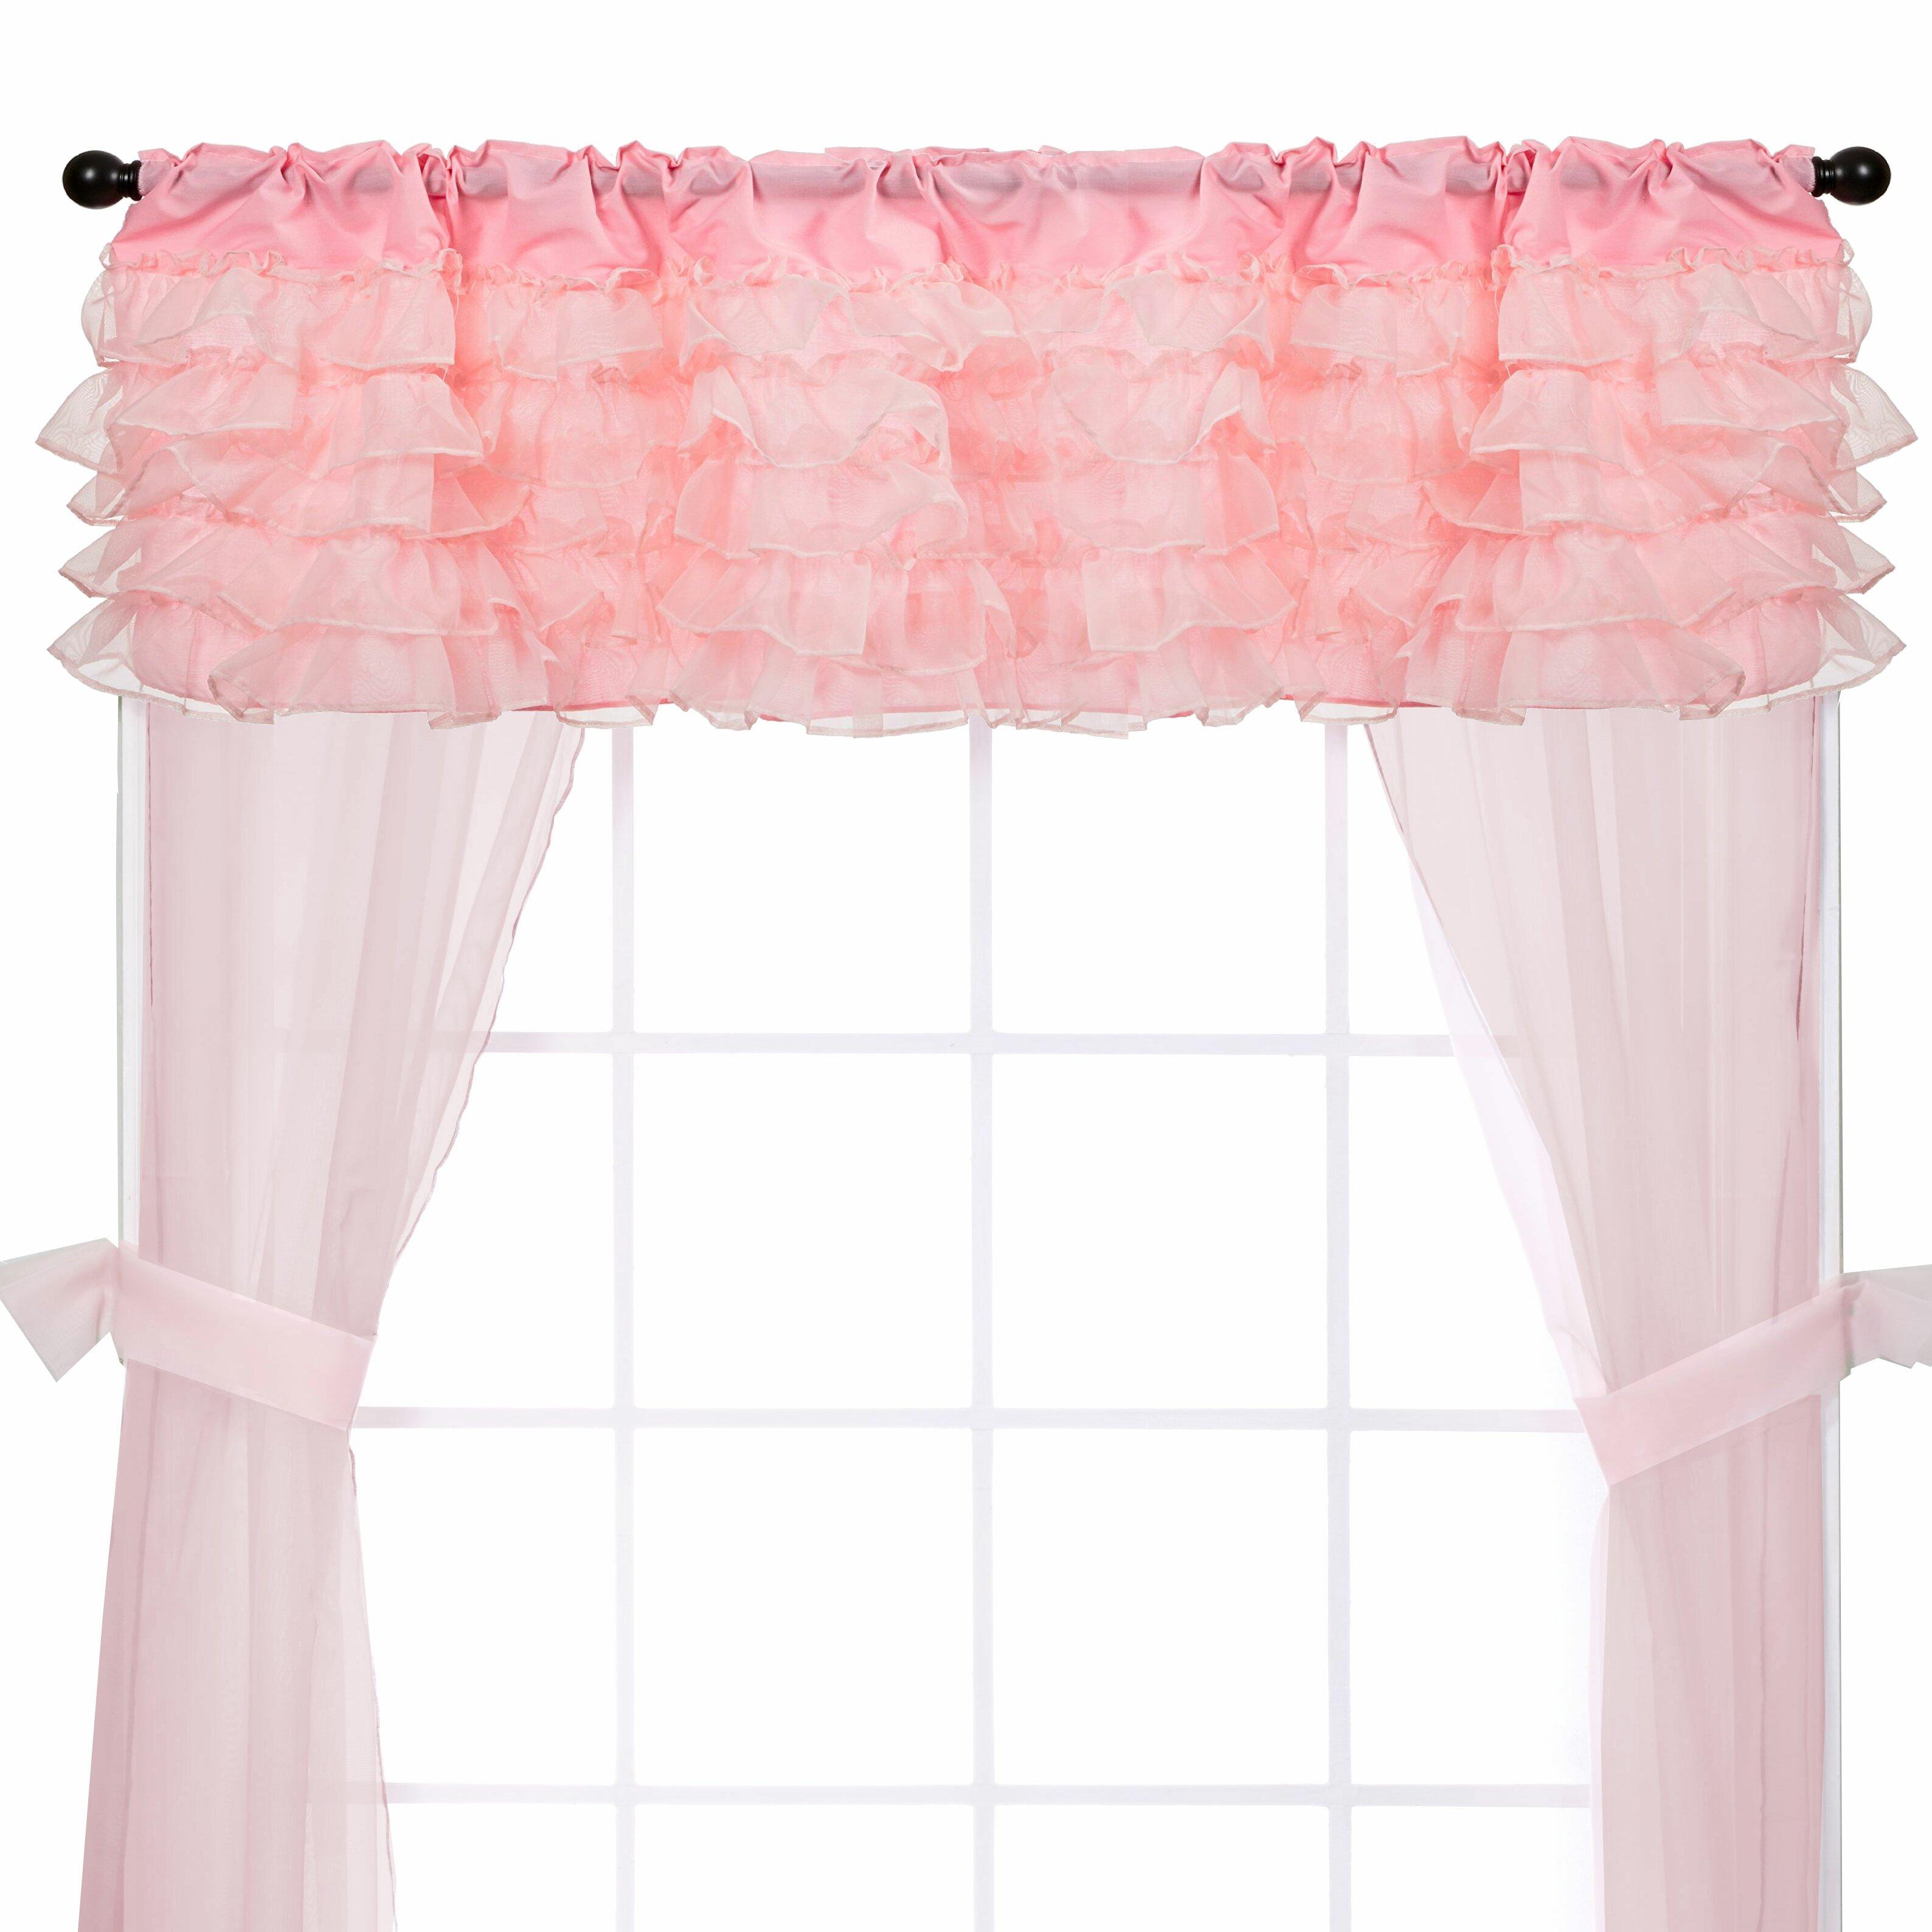 BabyDoll Bedding 72quot Curtain Valance Wayfair : Baby Doll Bedding 72 Curtain Valance from www.wayfair.com size 3177 x 3177 jpeg 472kB